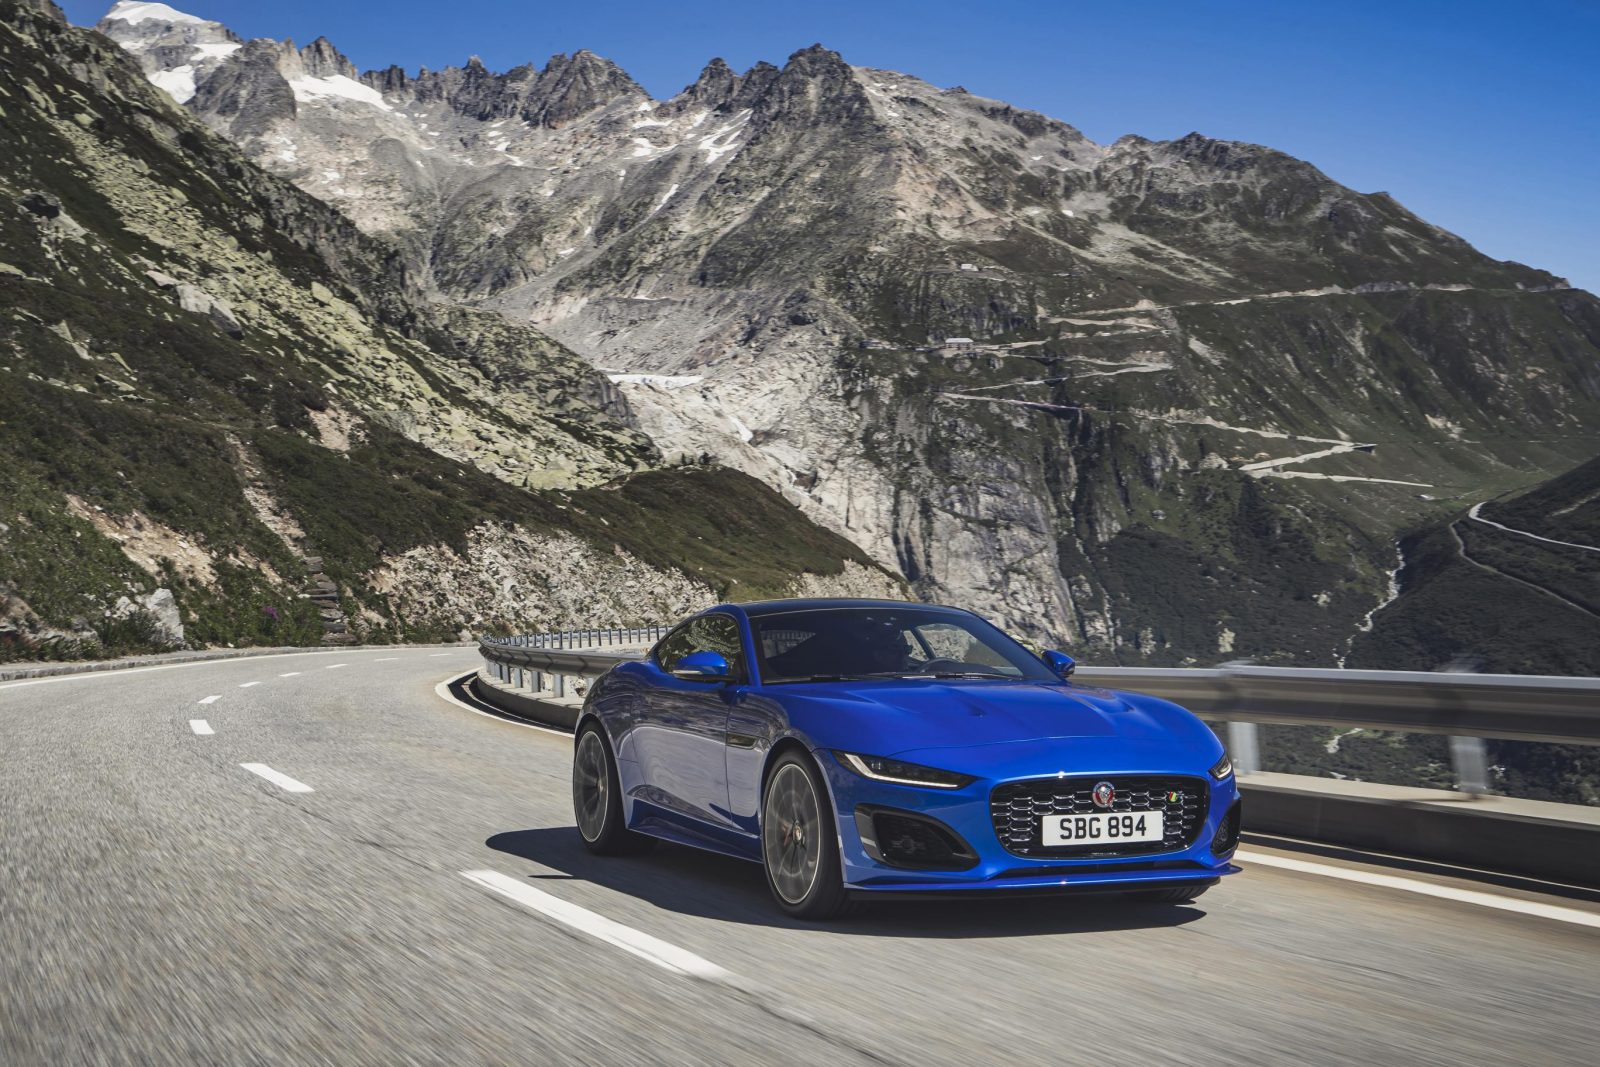 Jag F Type R 21my Velocity Blue Reveal Switzerland 02.12.19 06